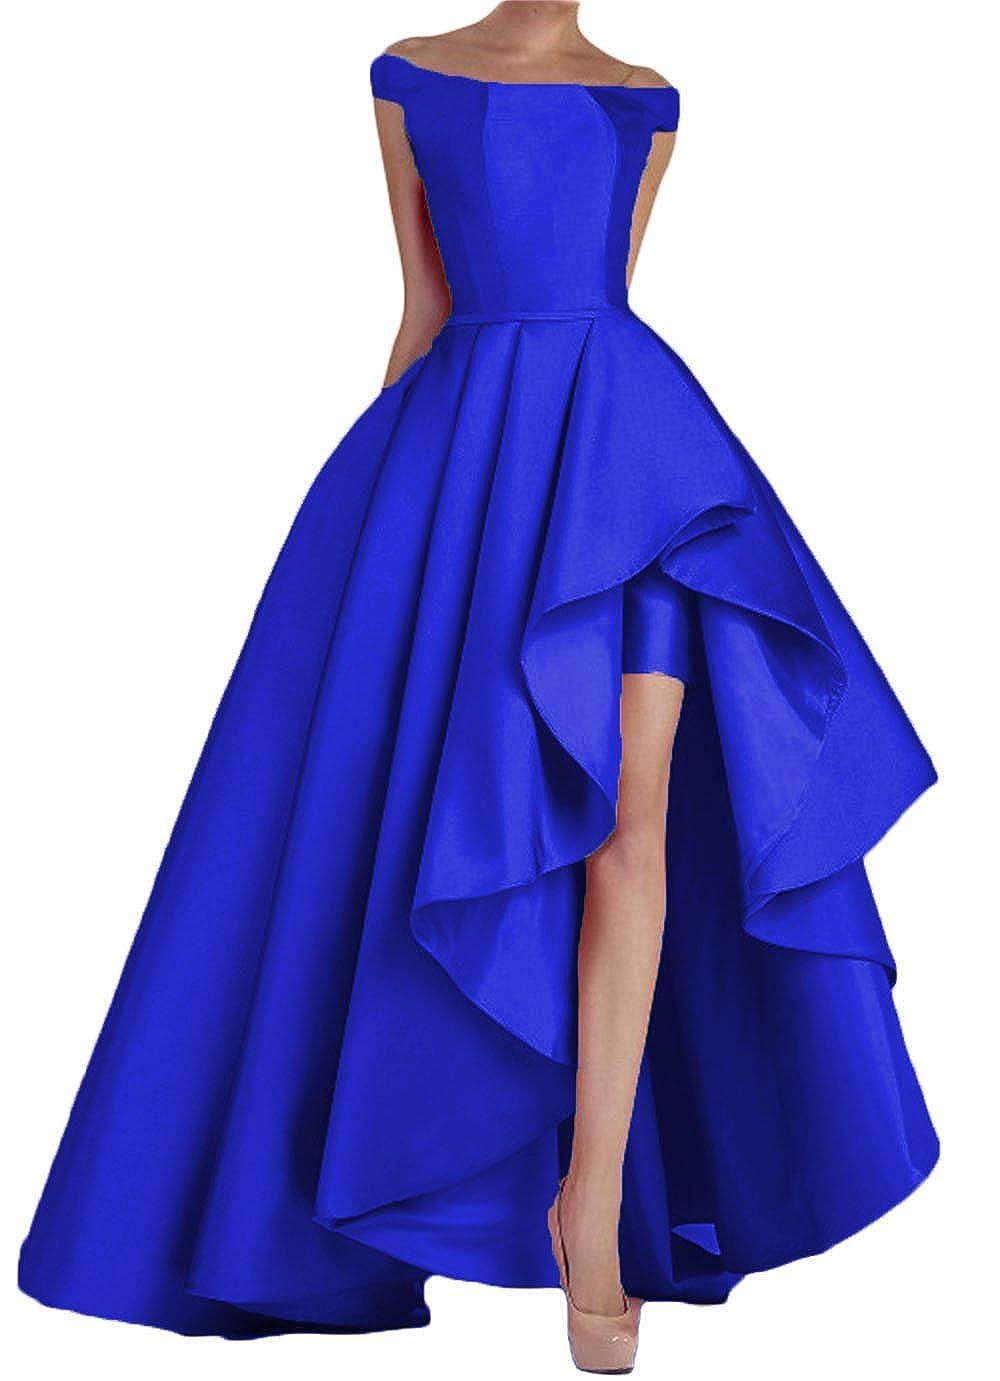 Royal bluee Dydsz Women's Off Shoulder Long Evening Prom Dresses Plus Size Formal Gowns D22